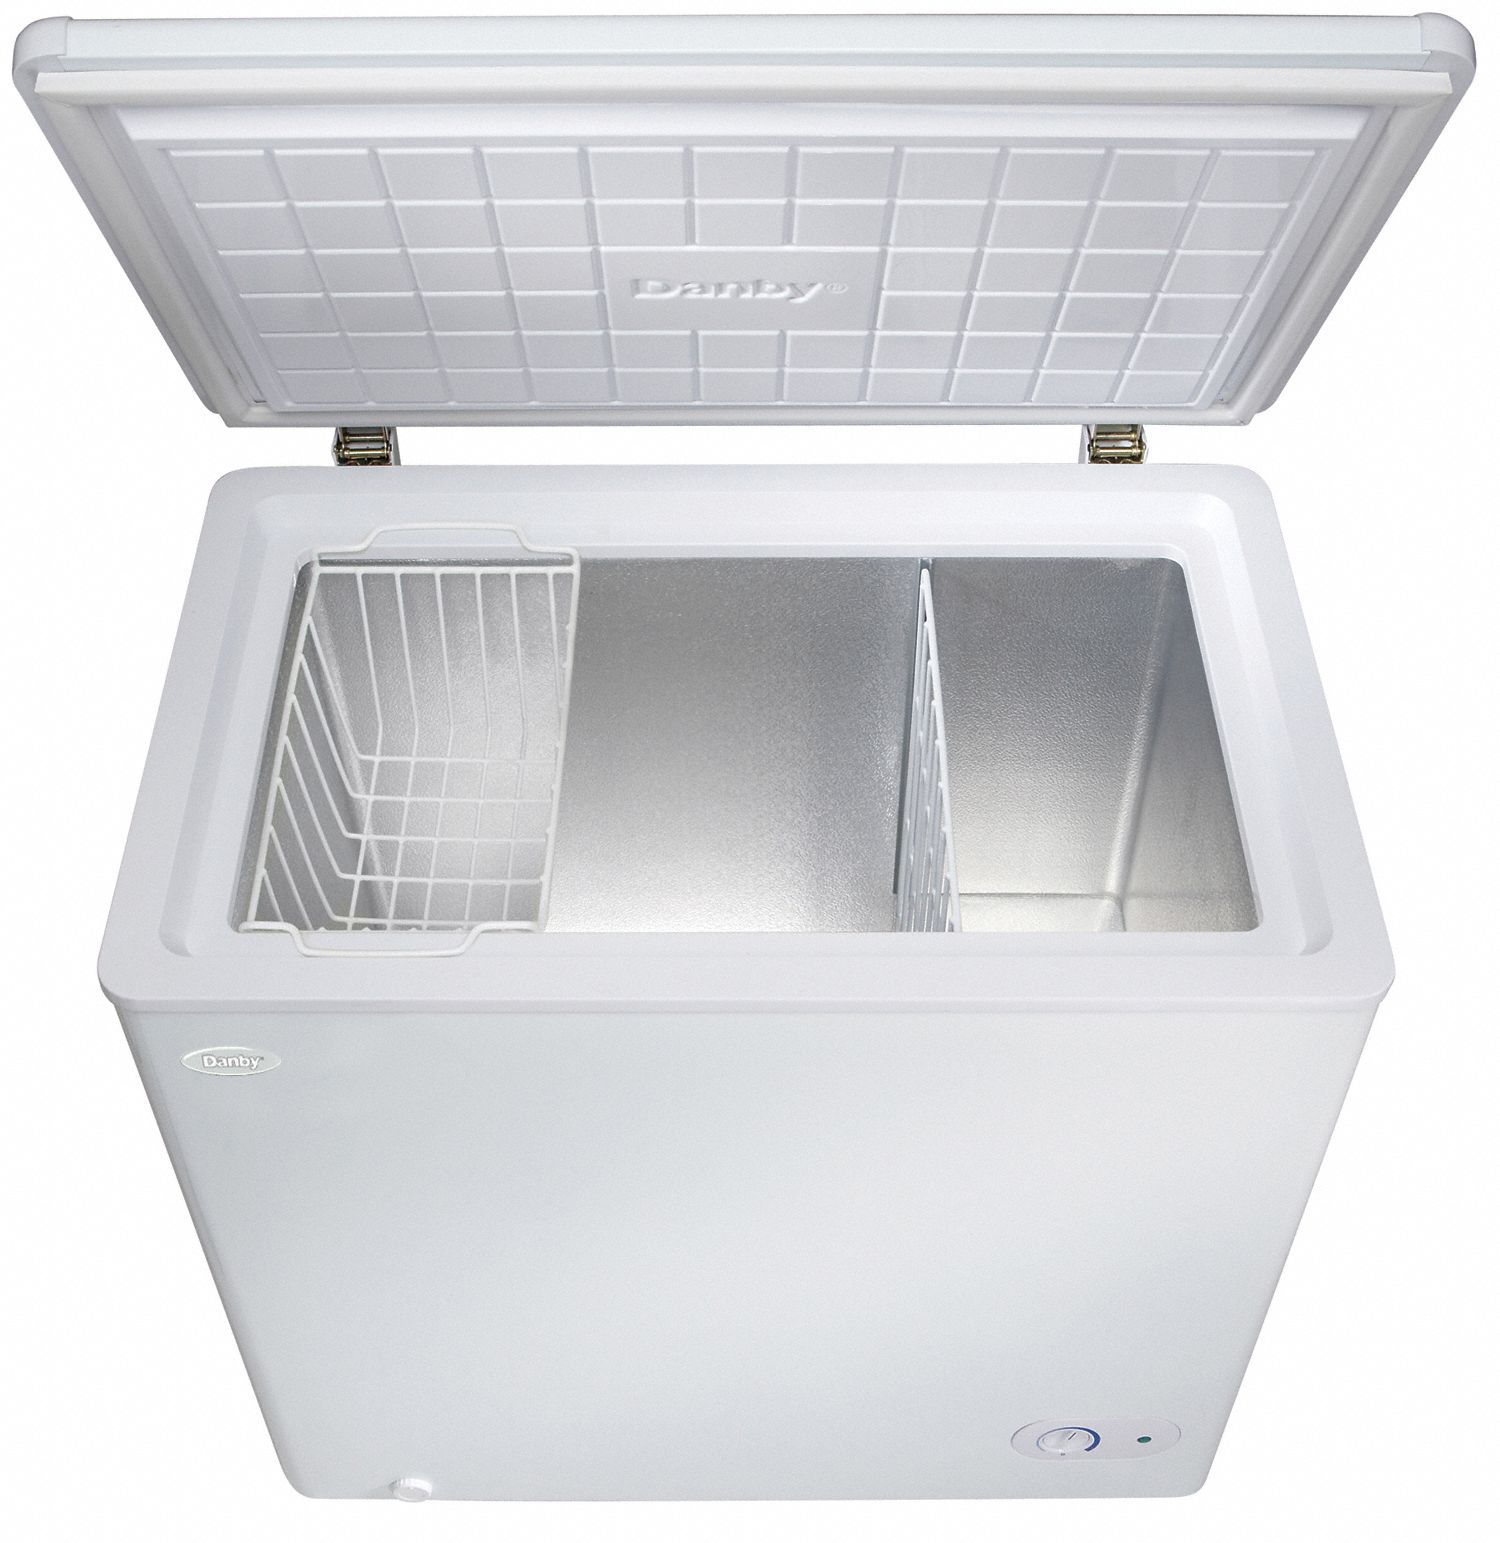 Danby 5.0 cu.ft Chest Freezer